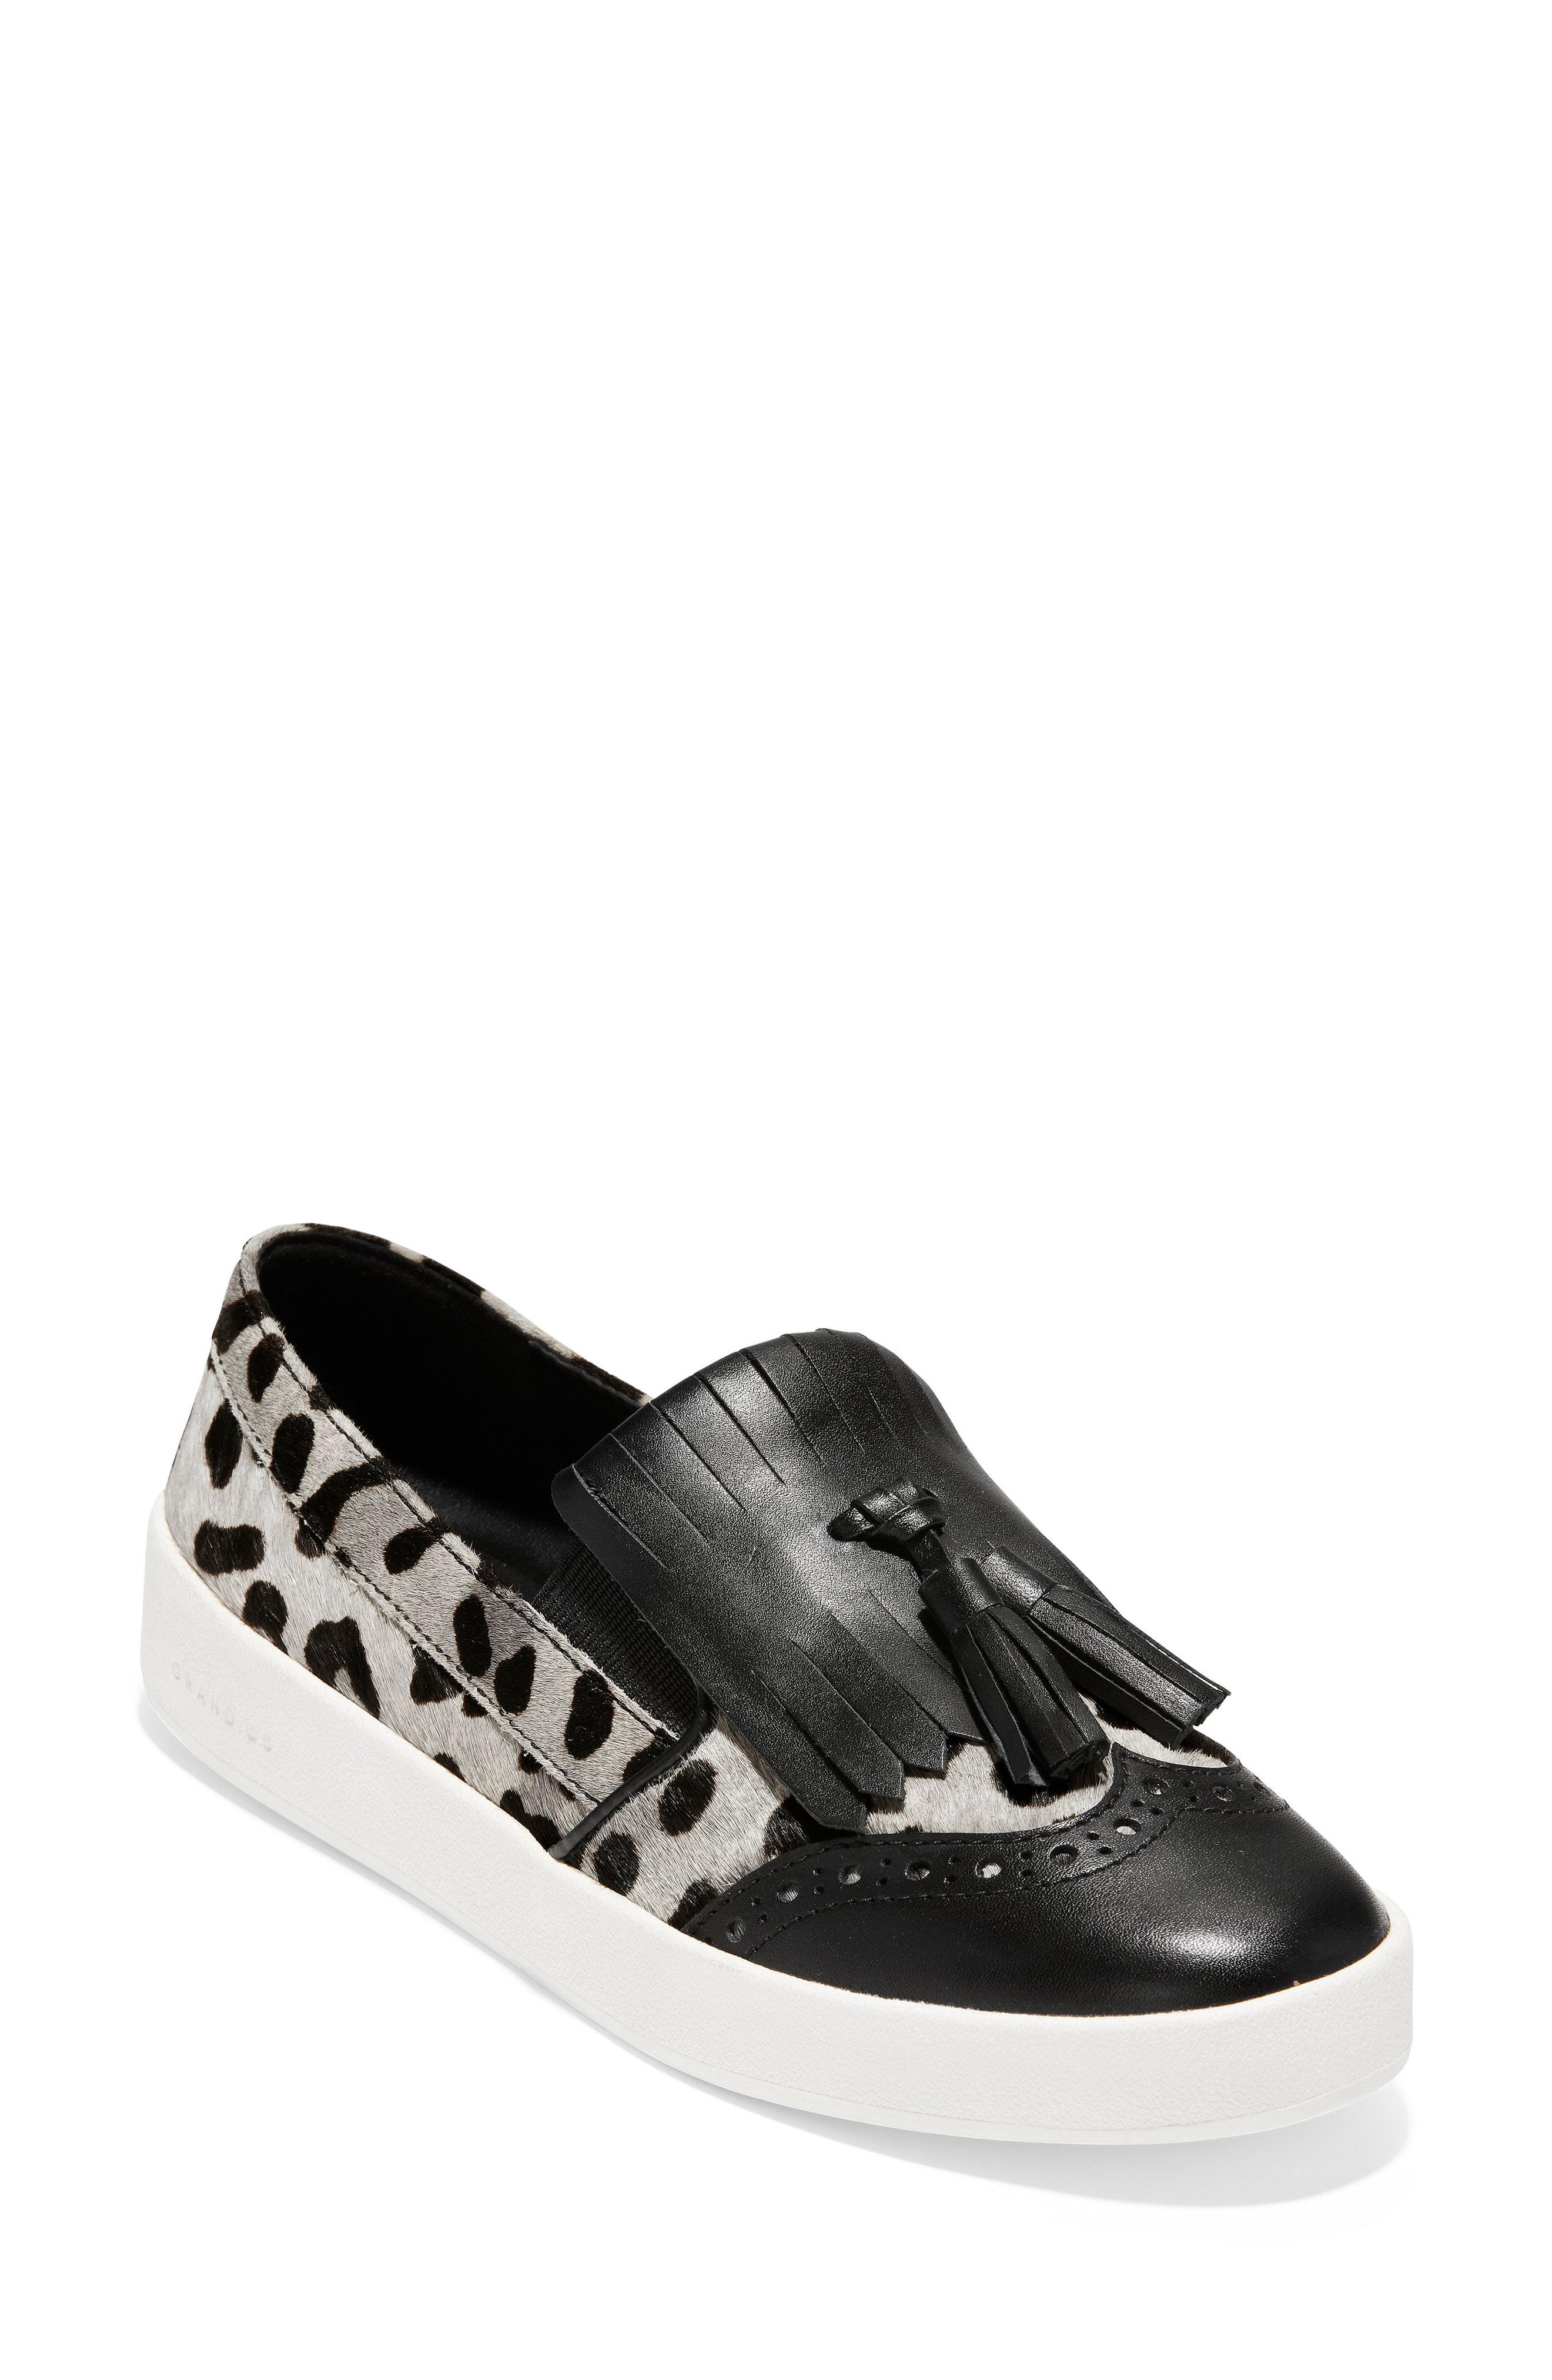 Cole Haan GrandPro Spectator Kiltie Sneaker (Women)